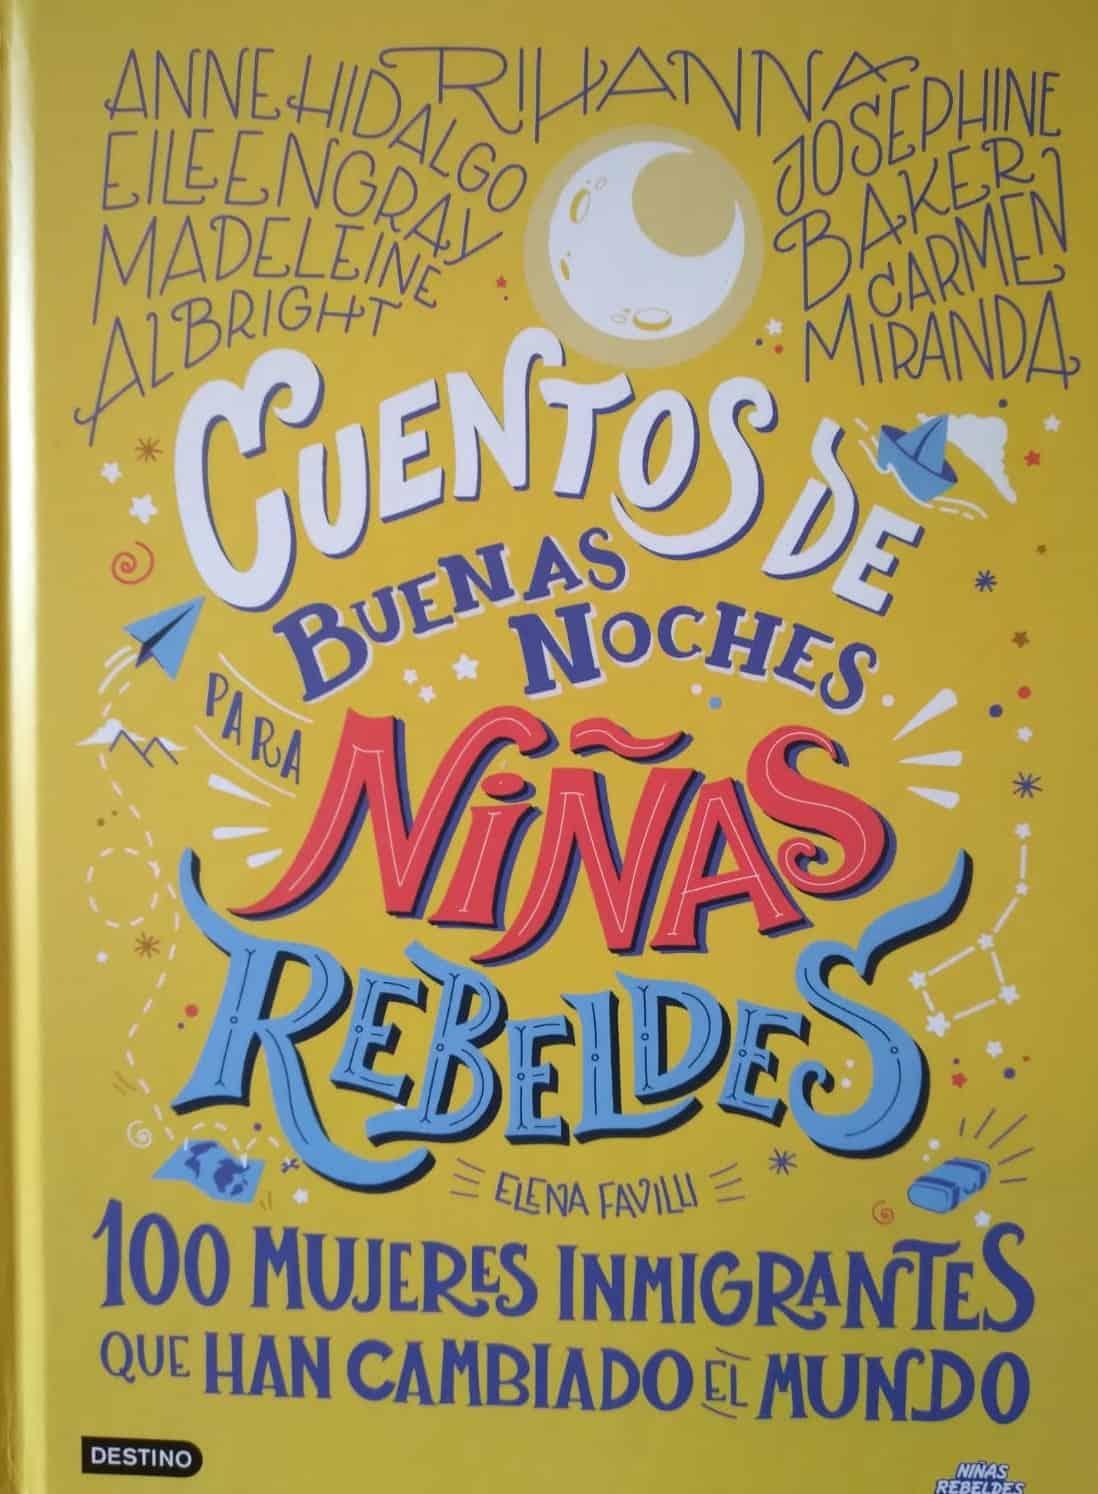 Niñas Rebeldes Inmigrantes